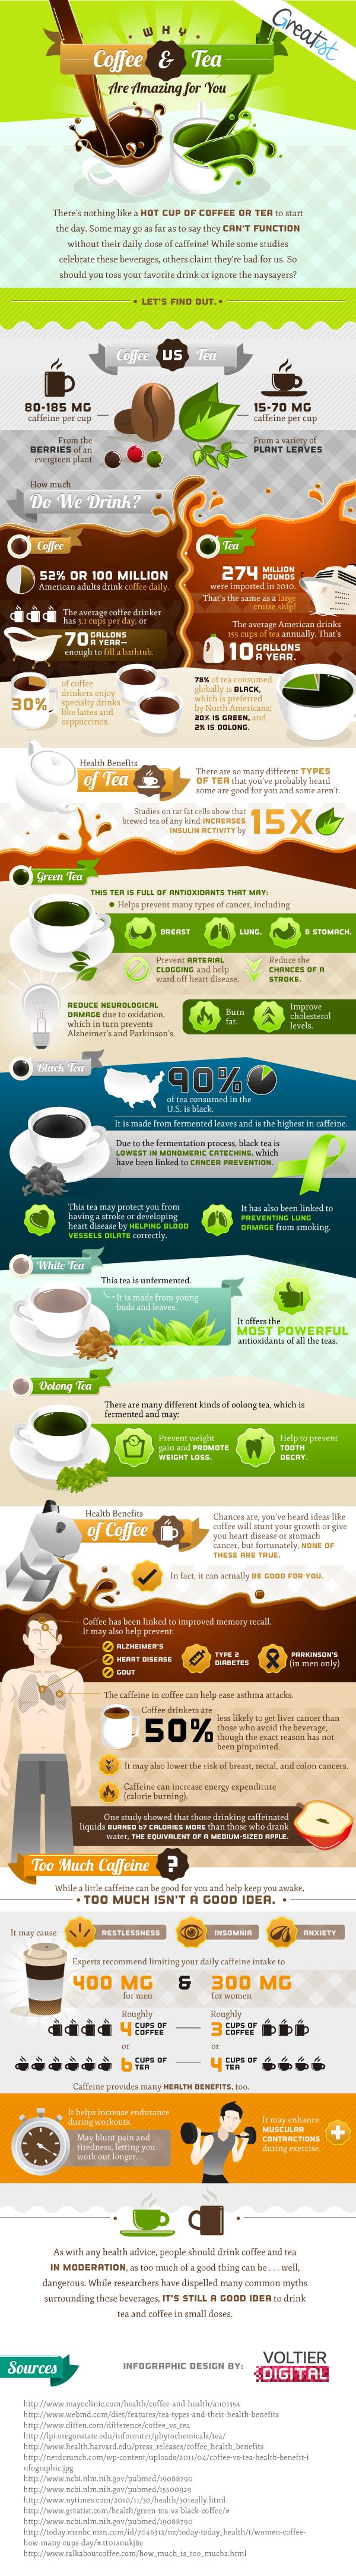 #Coffee and #Tea #Infographic